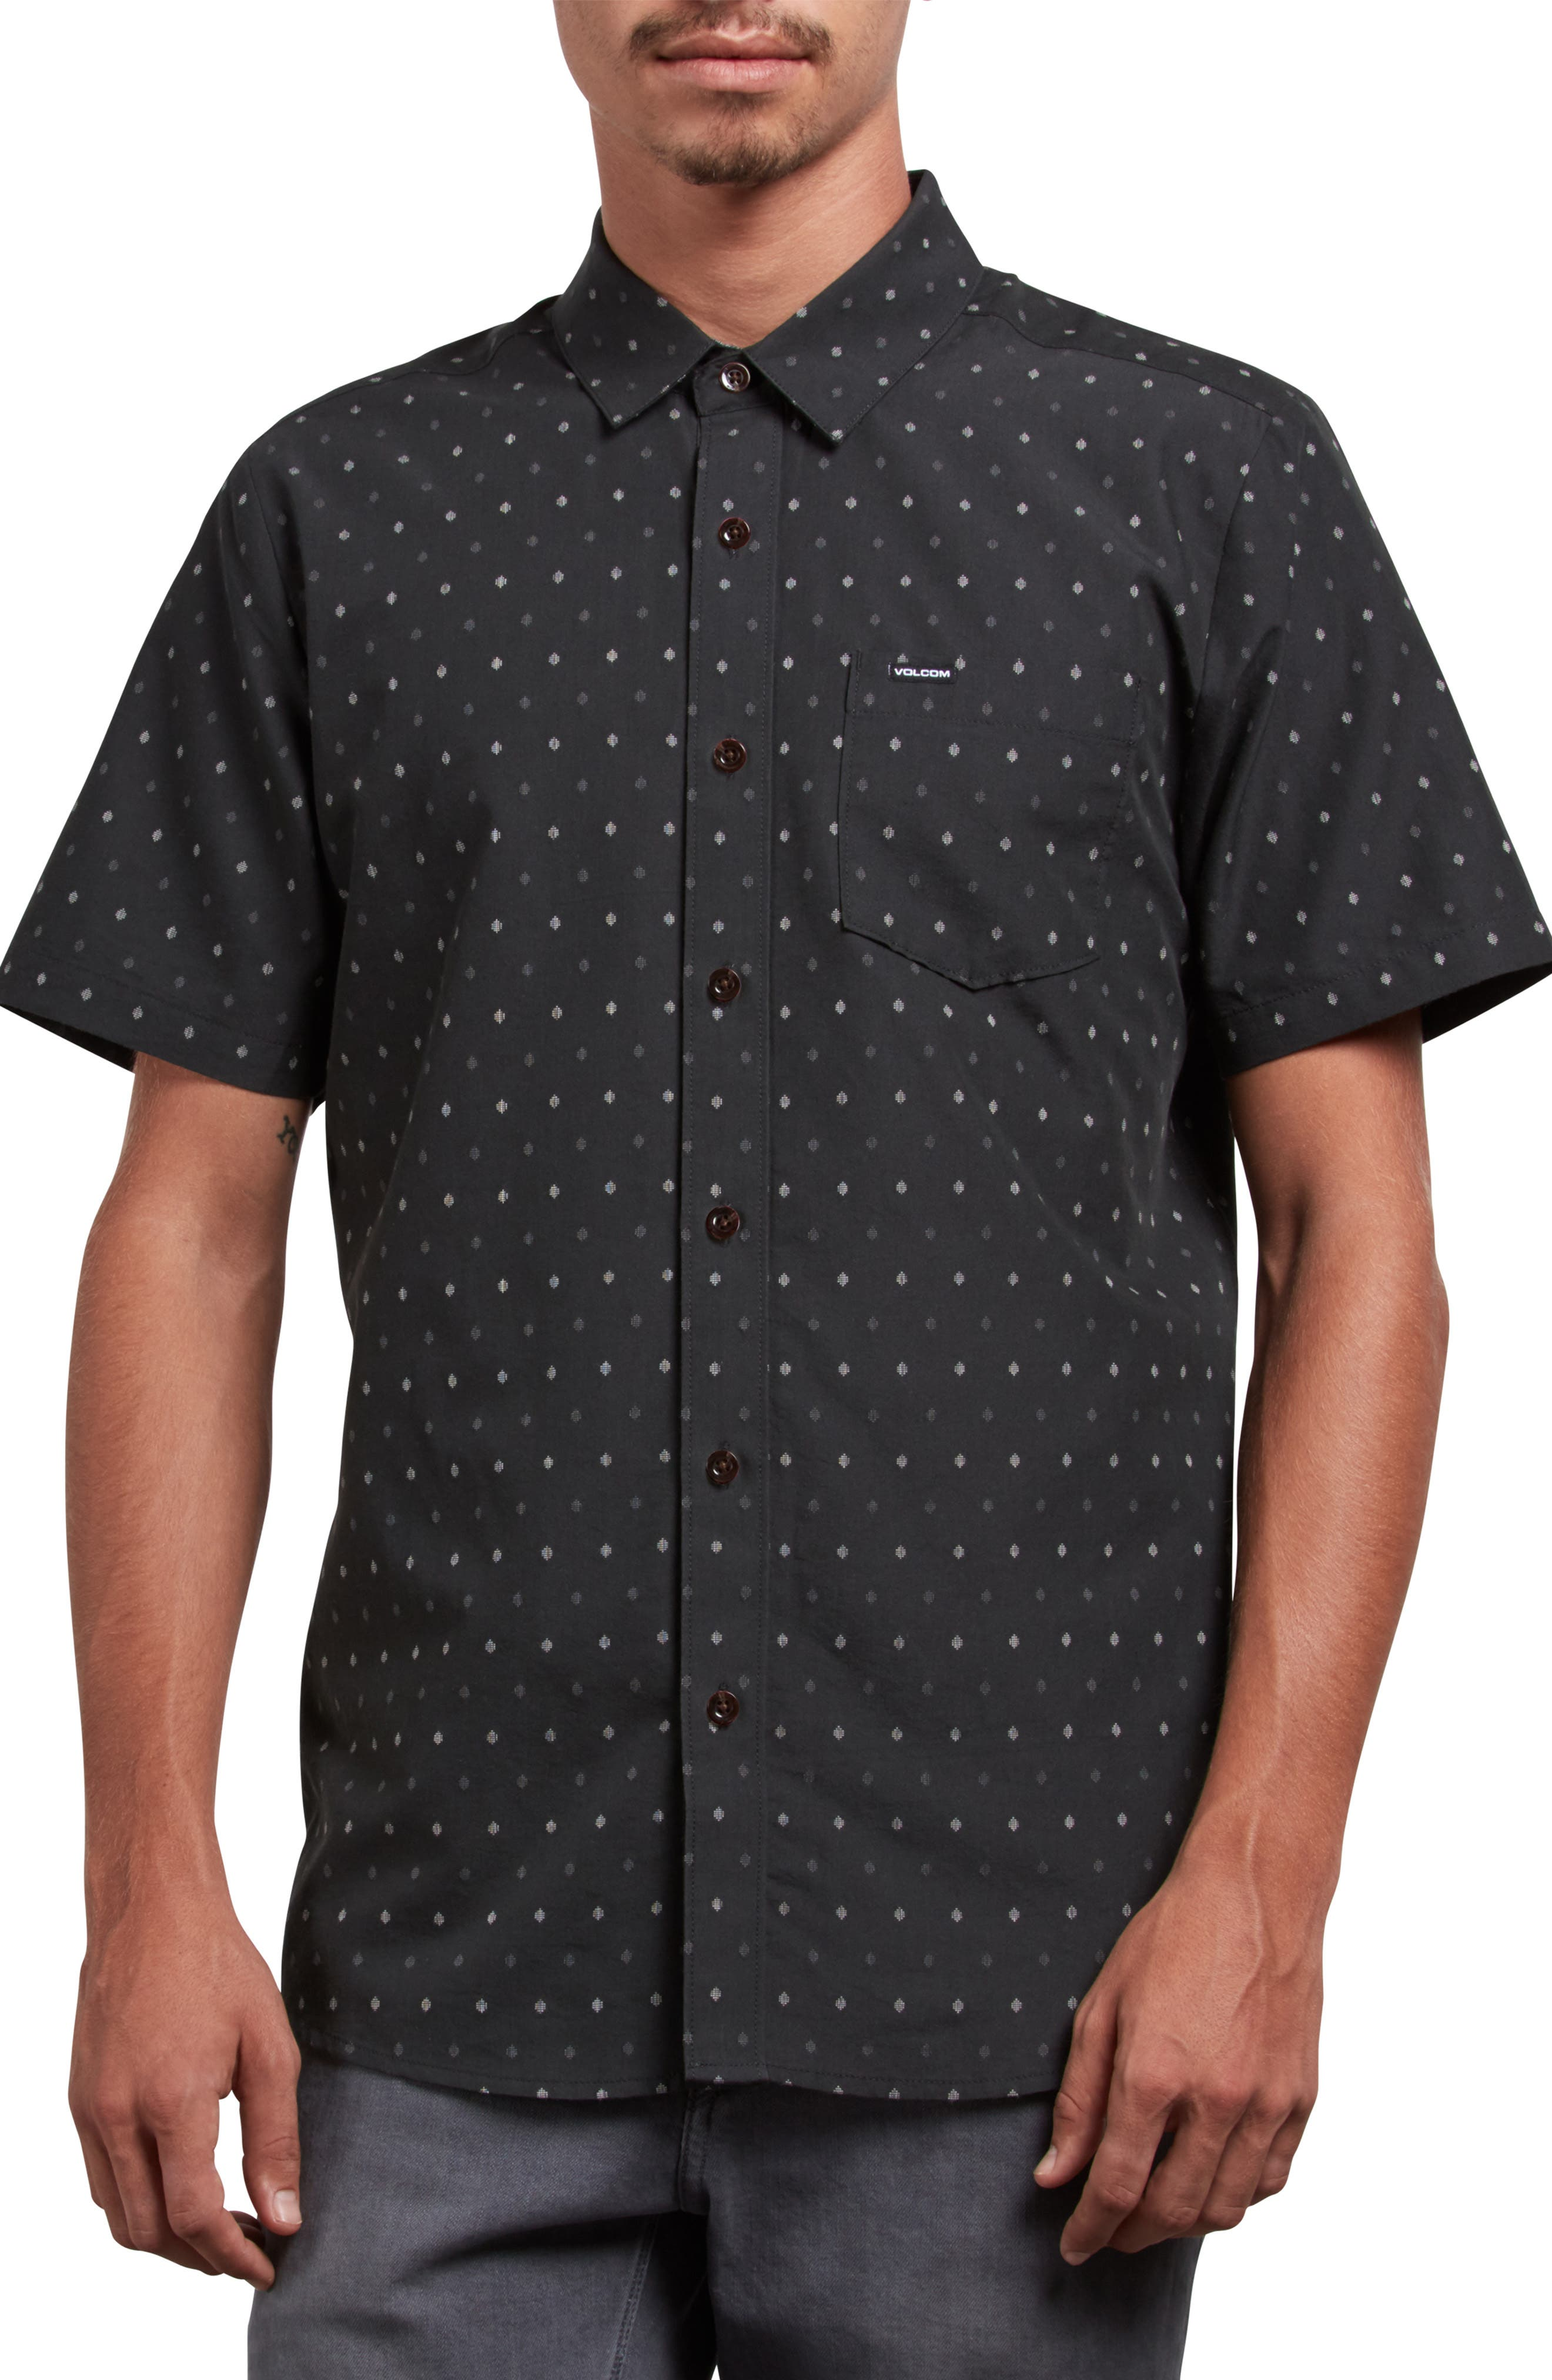 Frequency Dot Short Sleeve Woven Shirt,                             Main thumbnail 1, color,                             020